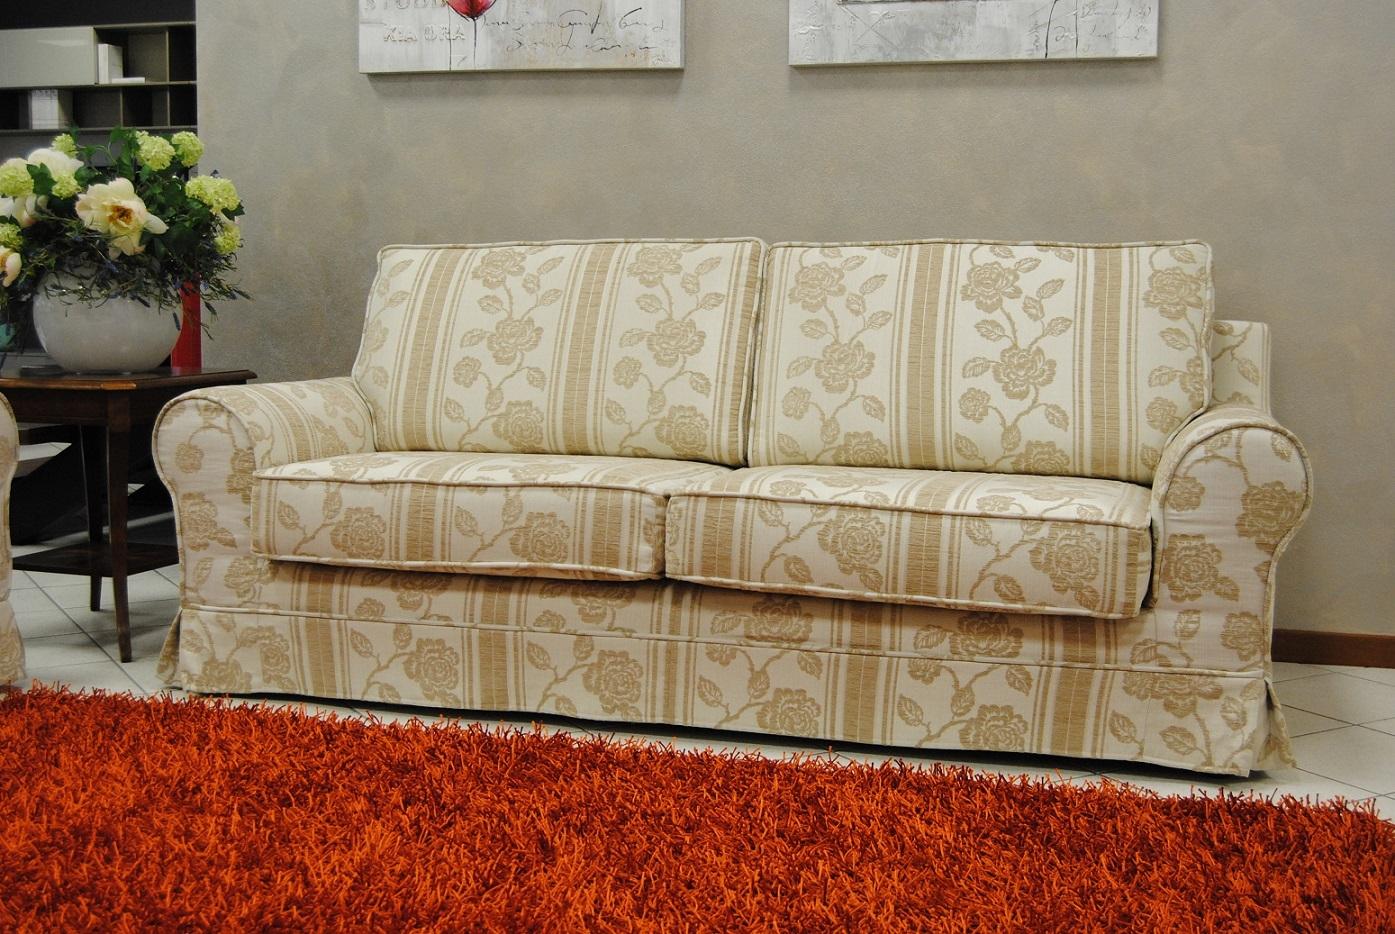 Divani in tessuto coppia di divani classici in tessuto for Prezzi divani angolari tessuto